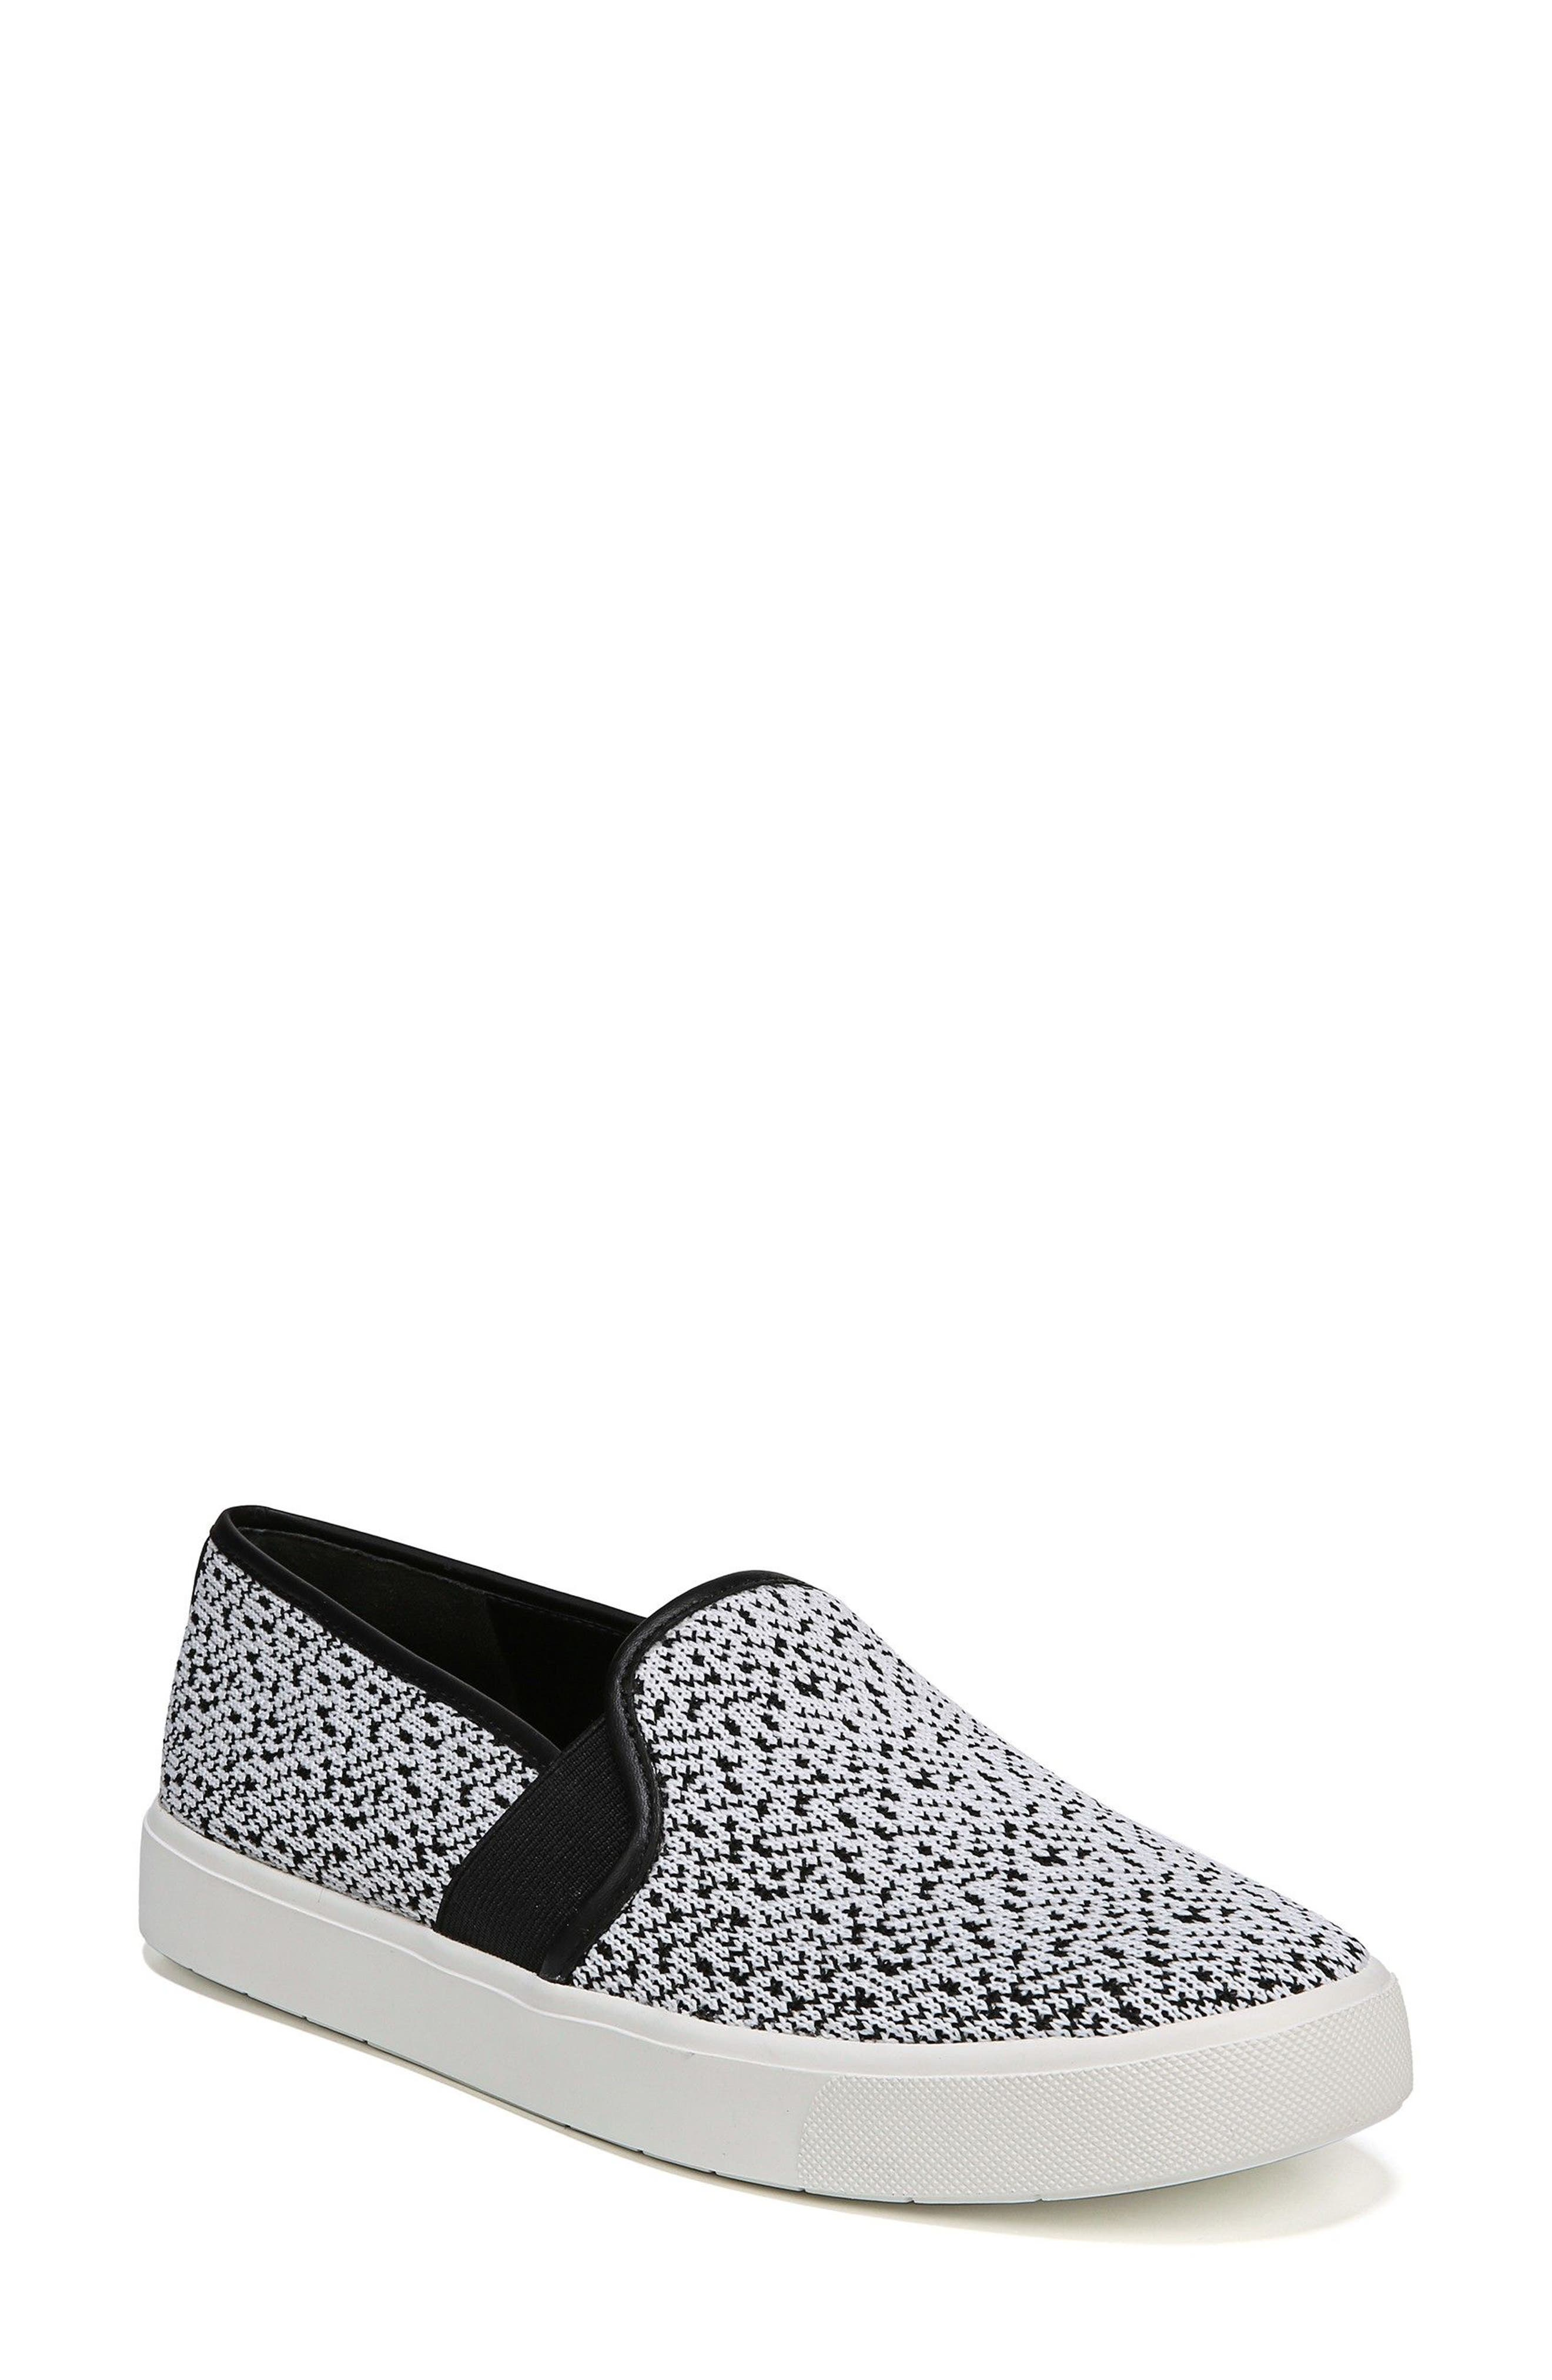 'Blair 12' Leather Slip-On Sneaker,                             Main thumbnail 1, color,                             WHITE/ BLACK YETI KNIT